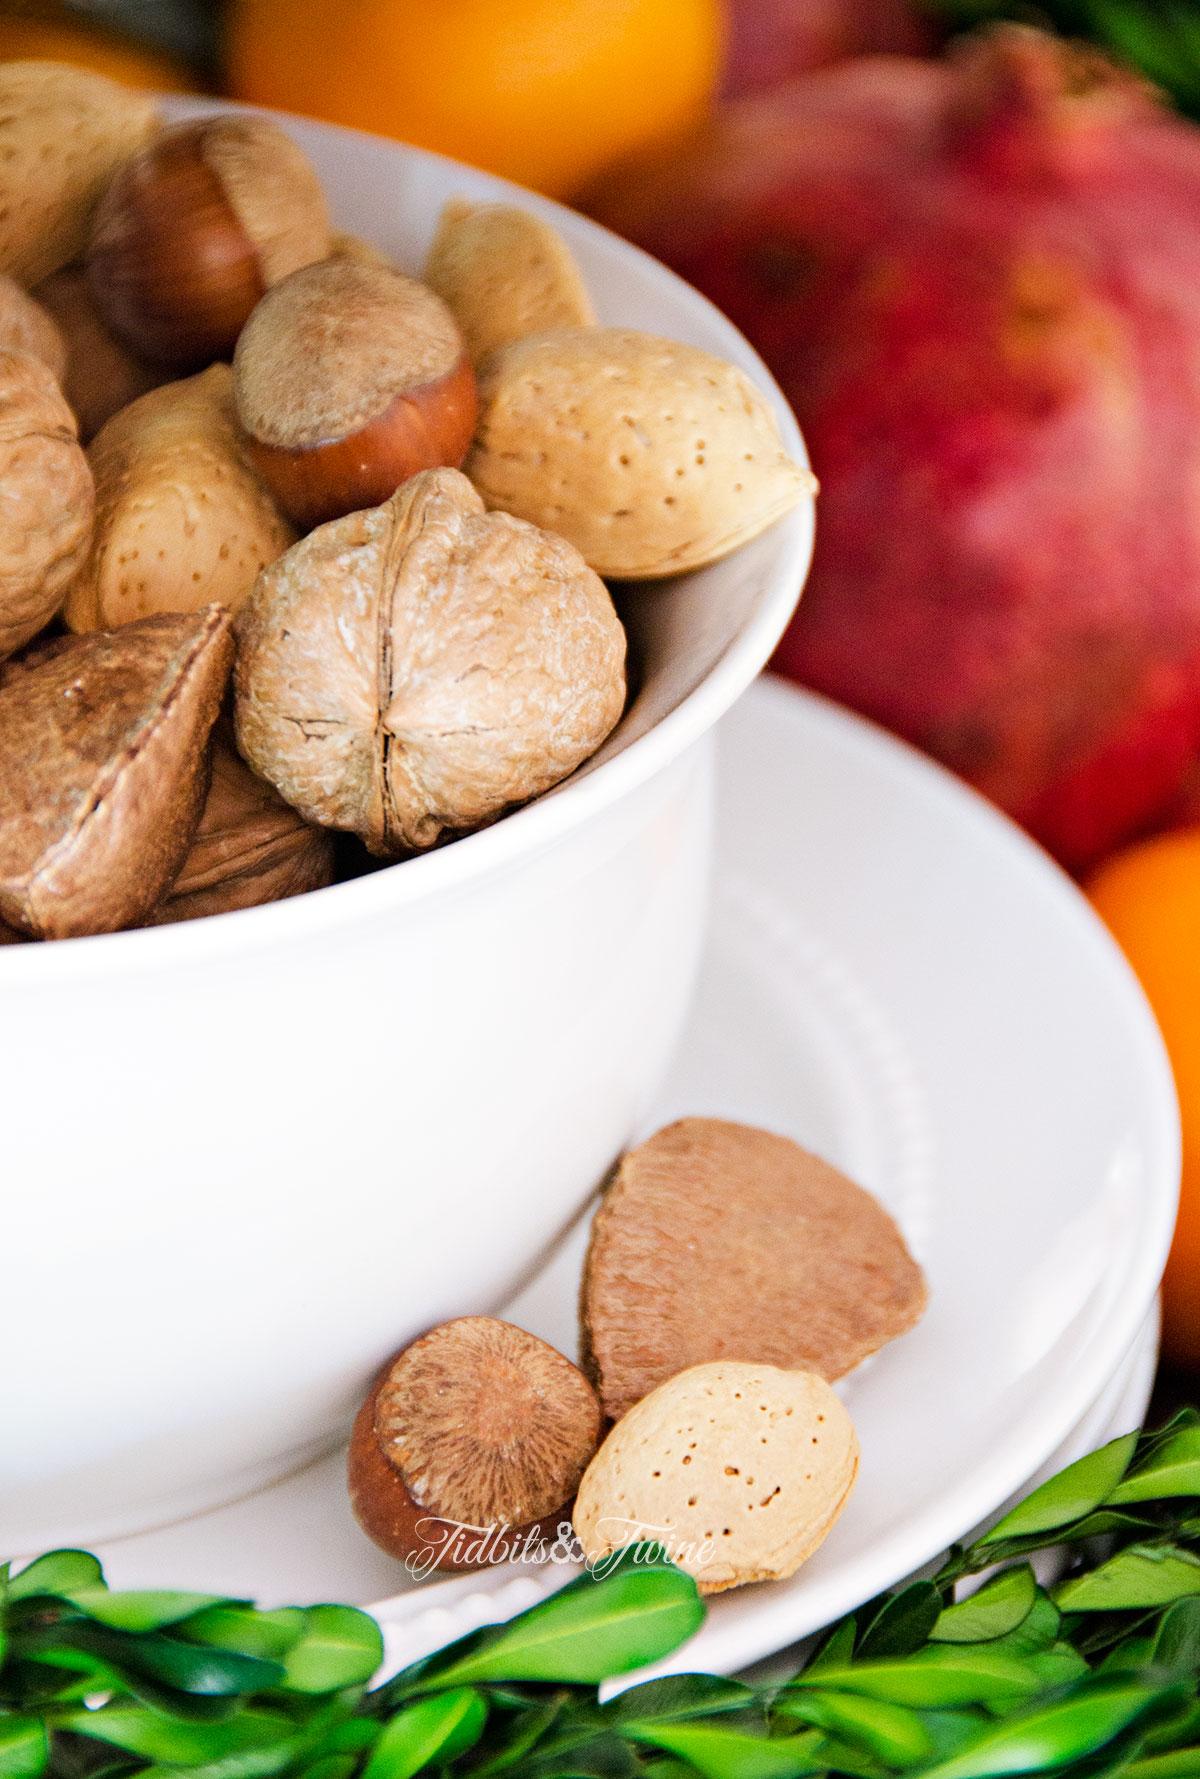 TIDBITS&TWINE-Nuts-and-Pomegranates-Christmas-2015